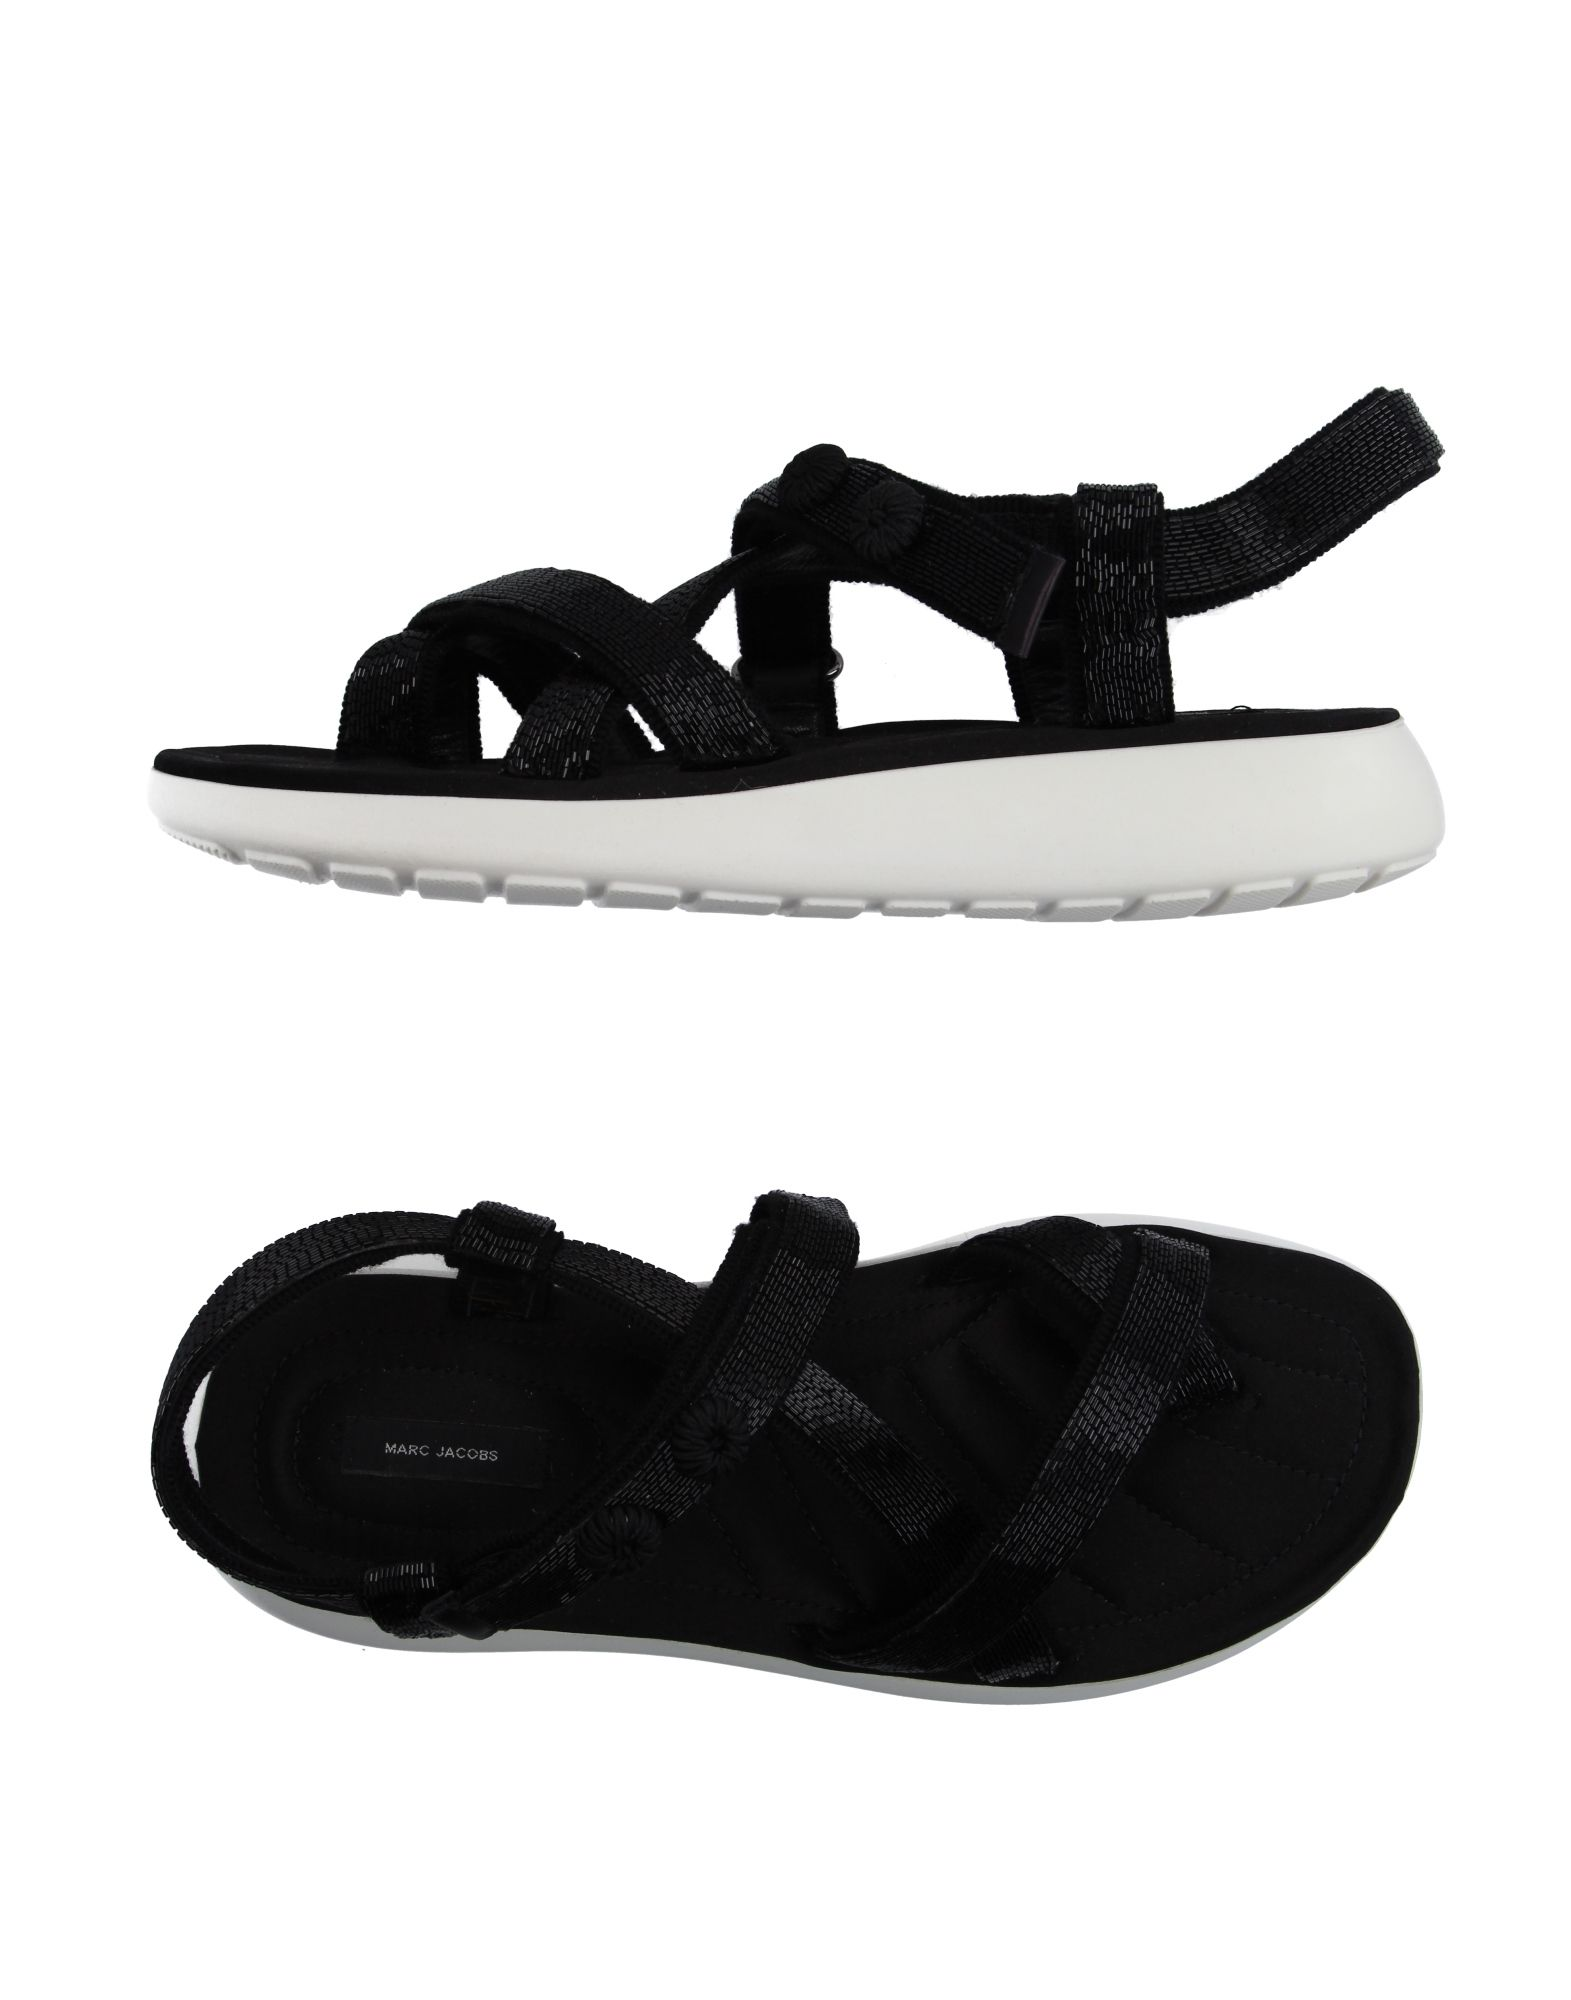 23df523125fd Marc Jacobs Flip Flops - Women Marc Jacobs Flip Flops online on YOOX Hong  Kong - 11133412VE